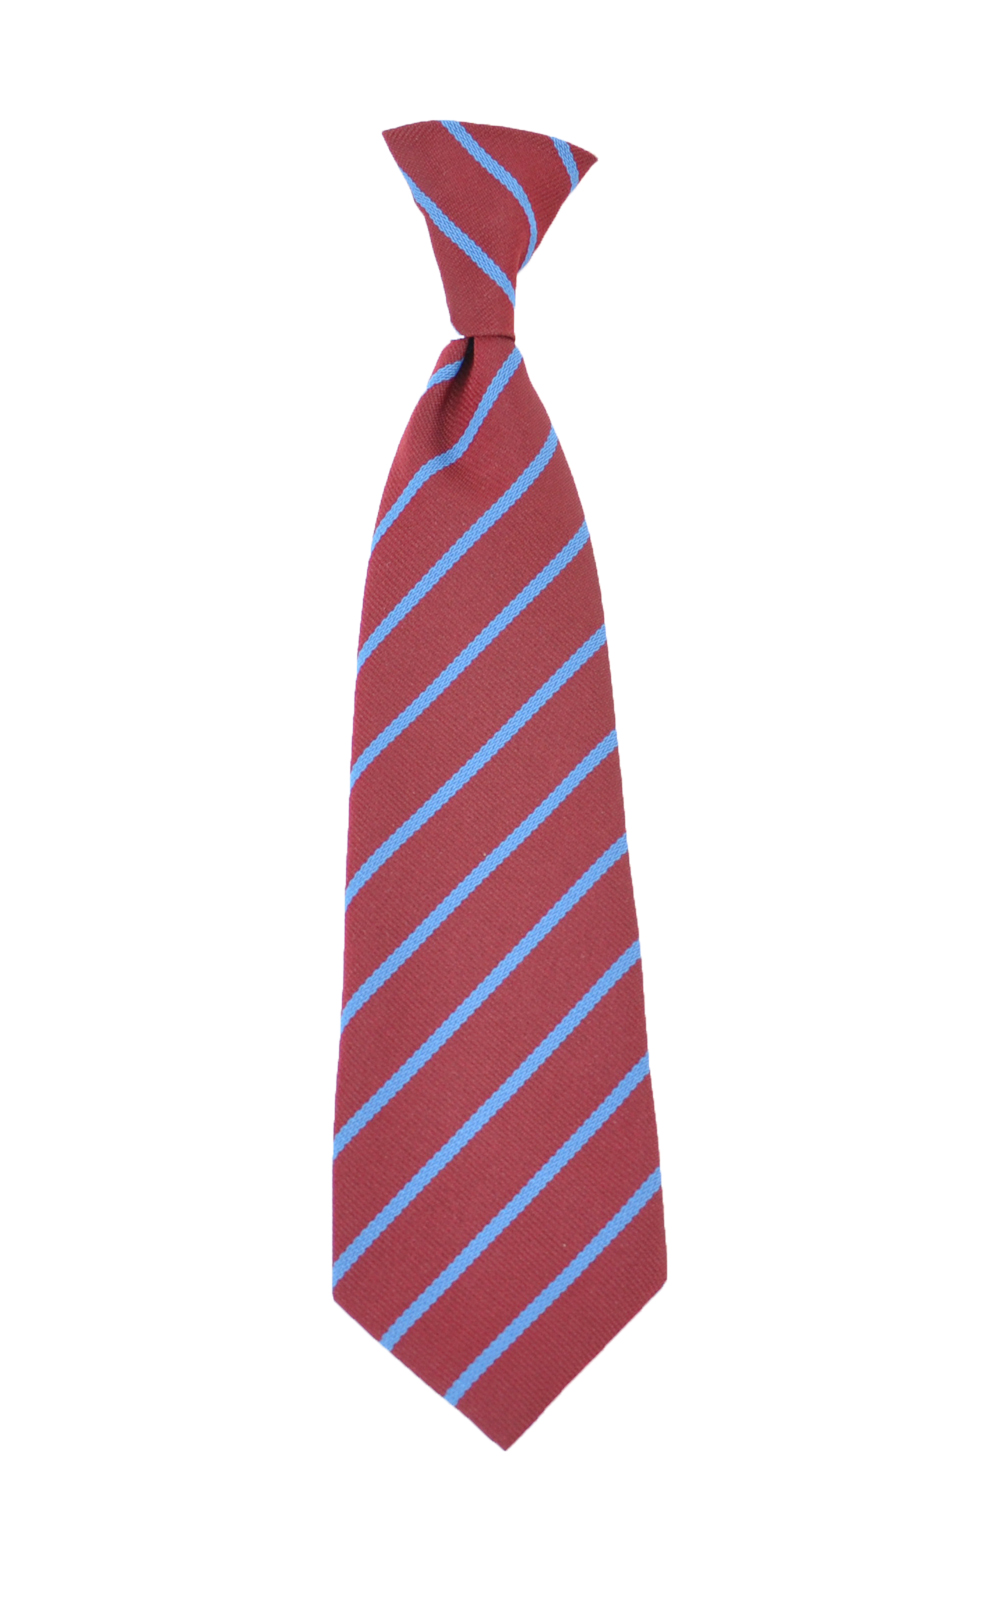 Picture of Damhead PS Elastic Tie - Unicol